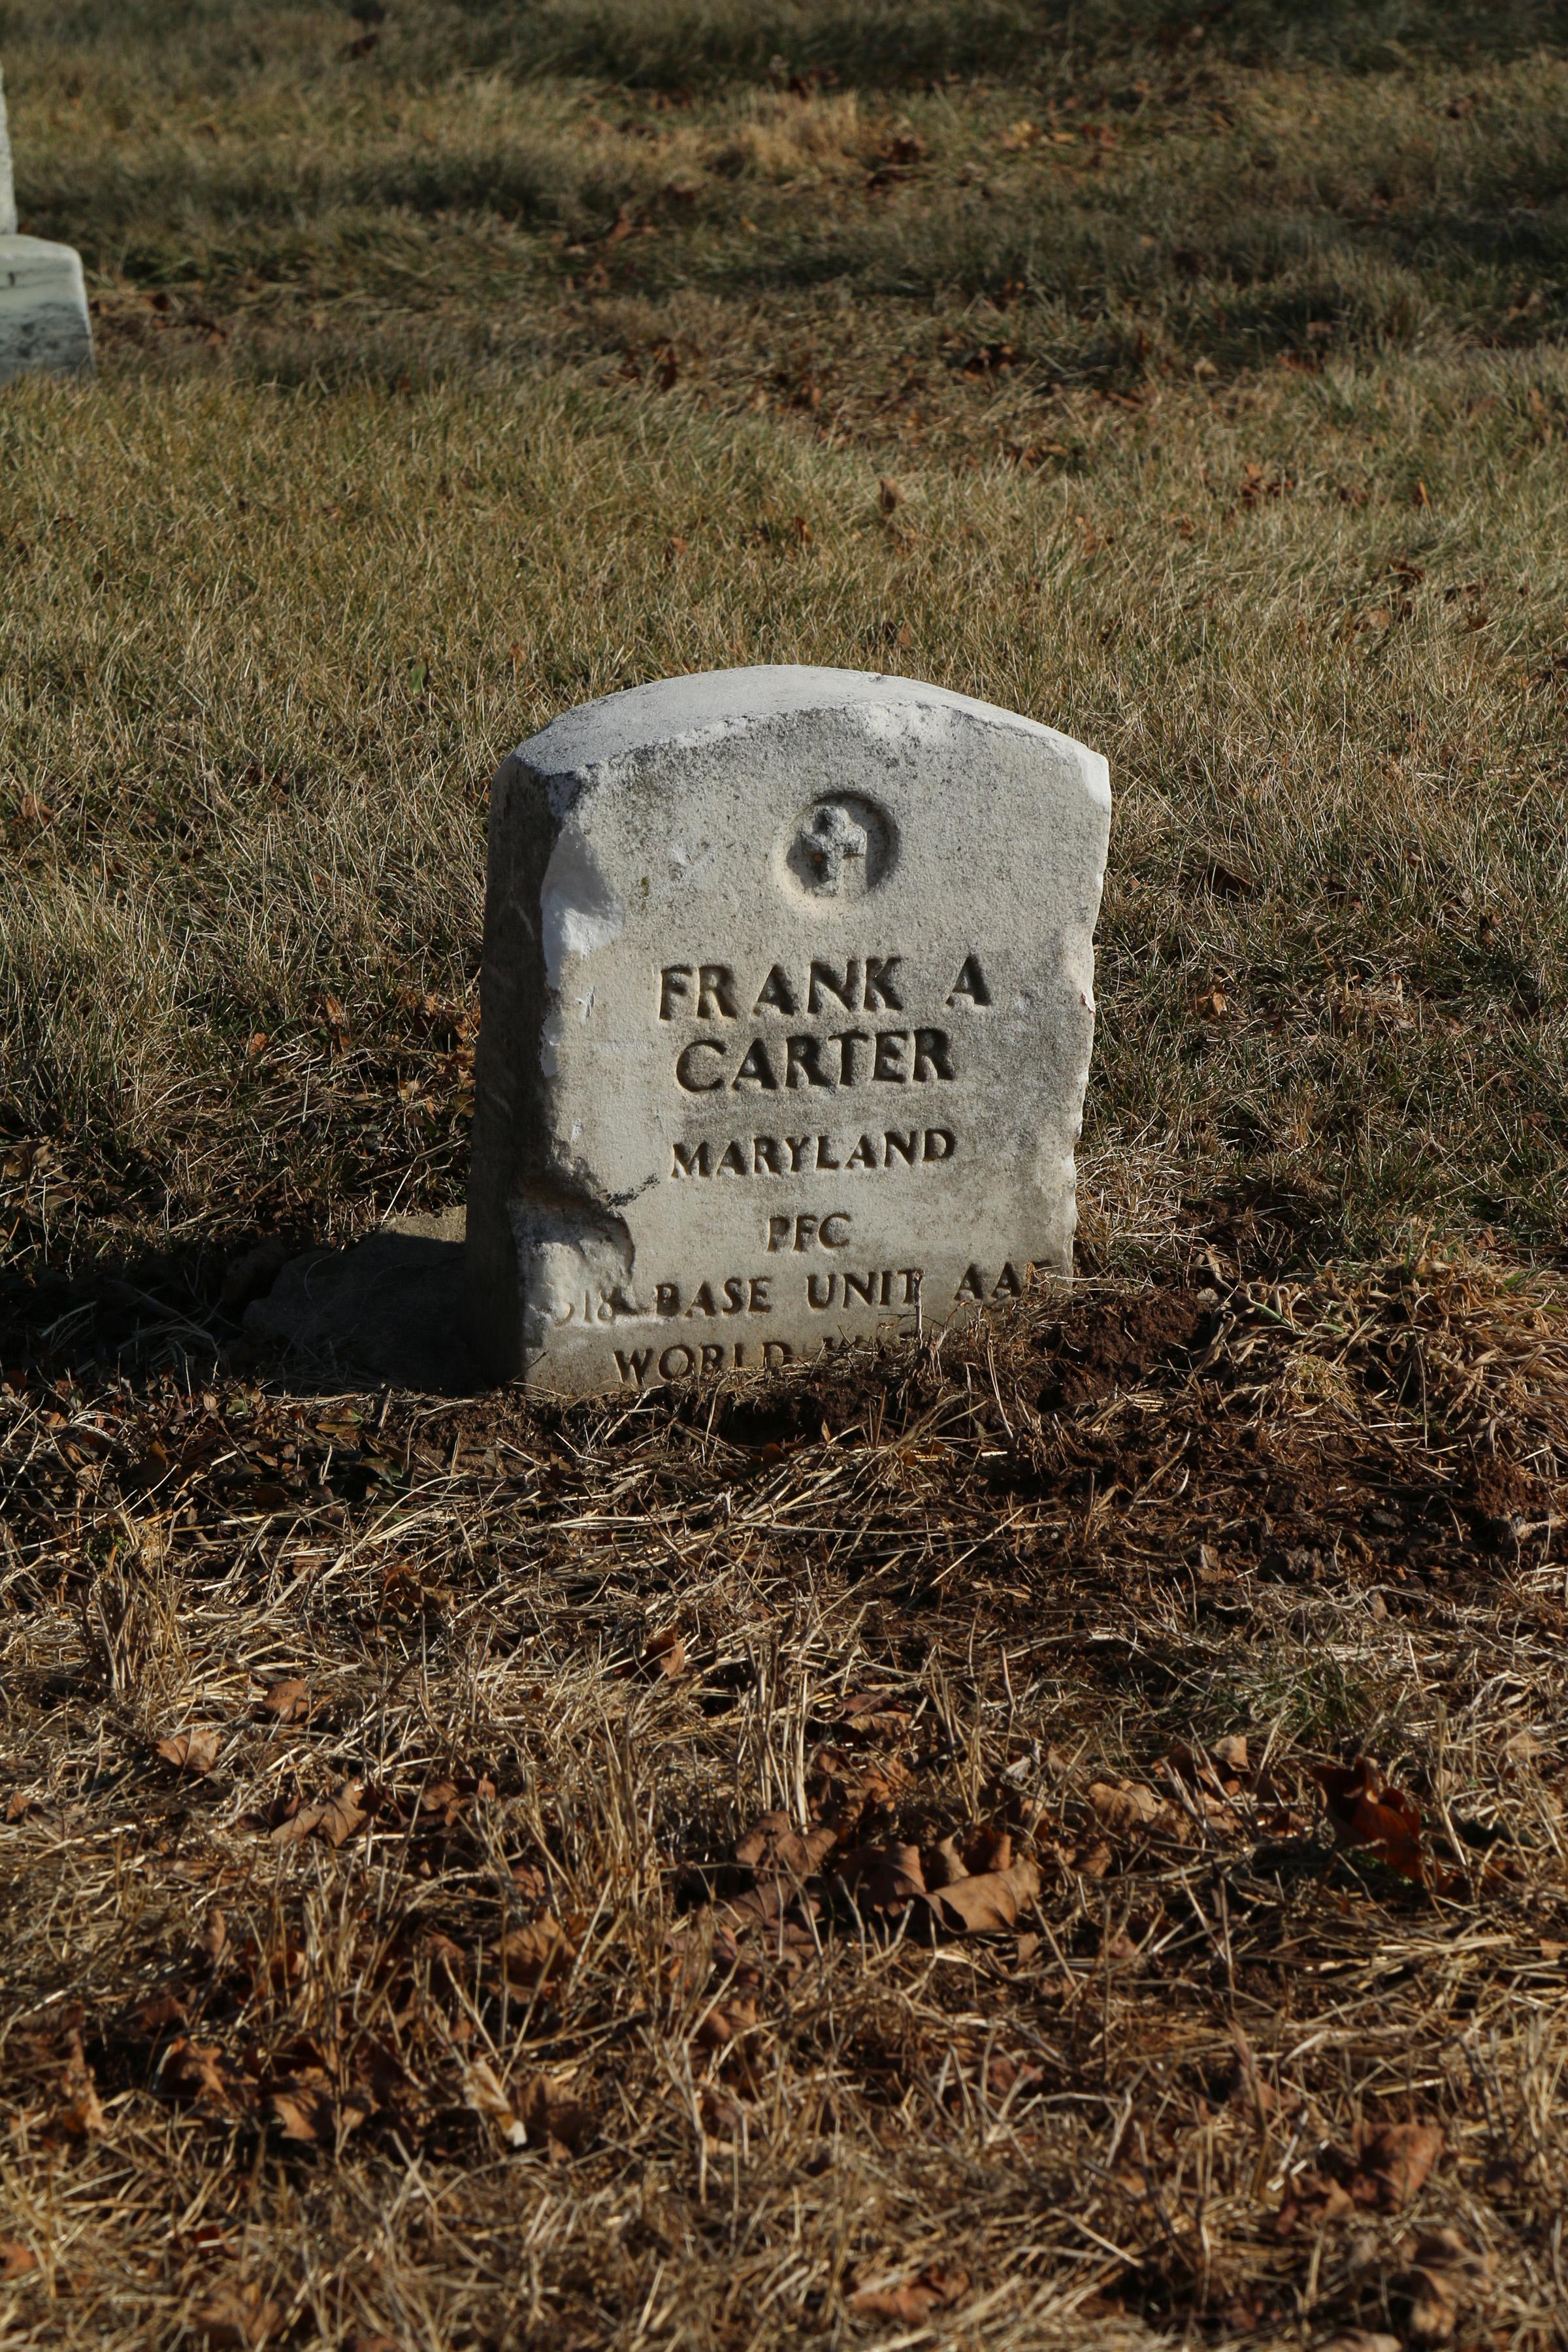 Pfc. Frank A. Carter